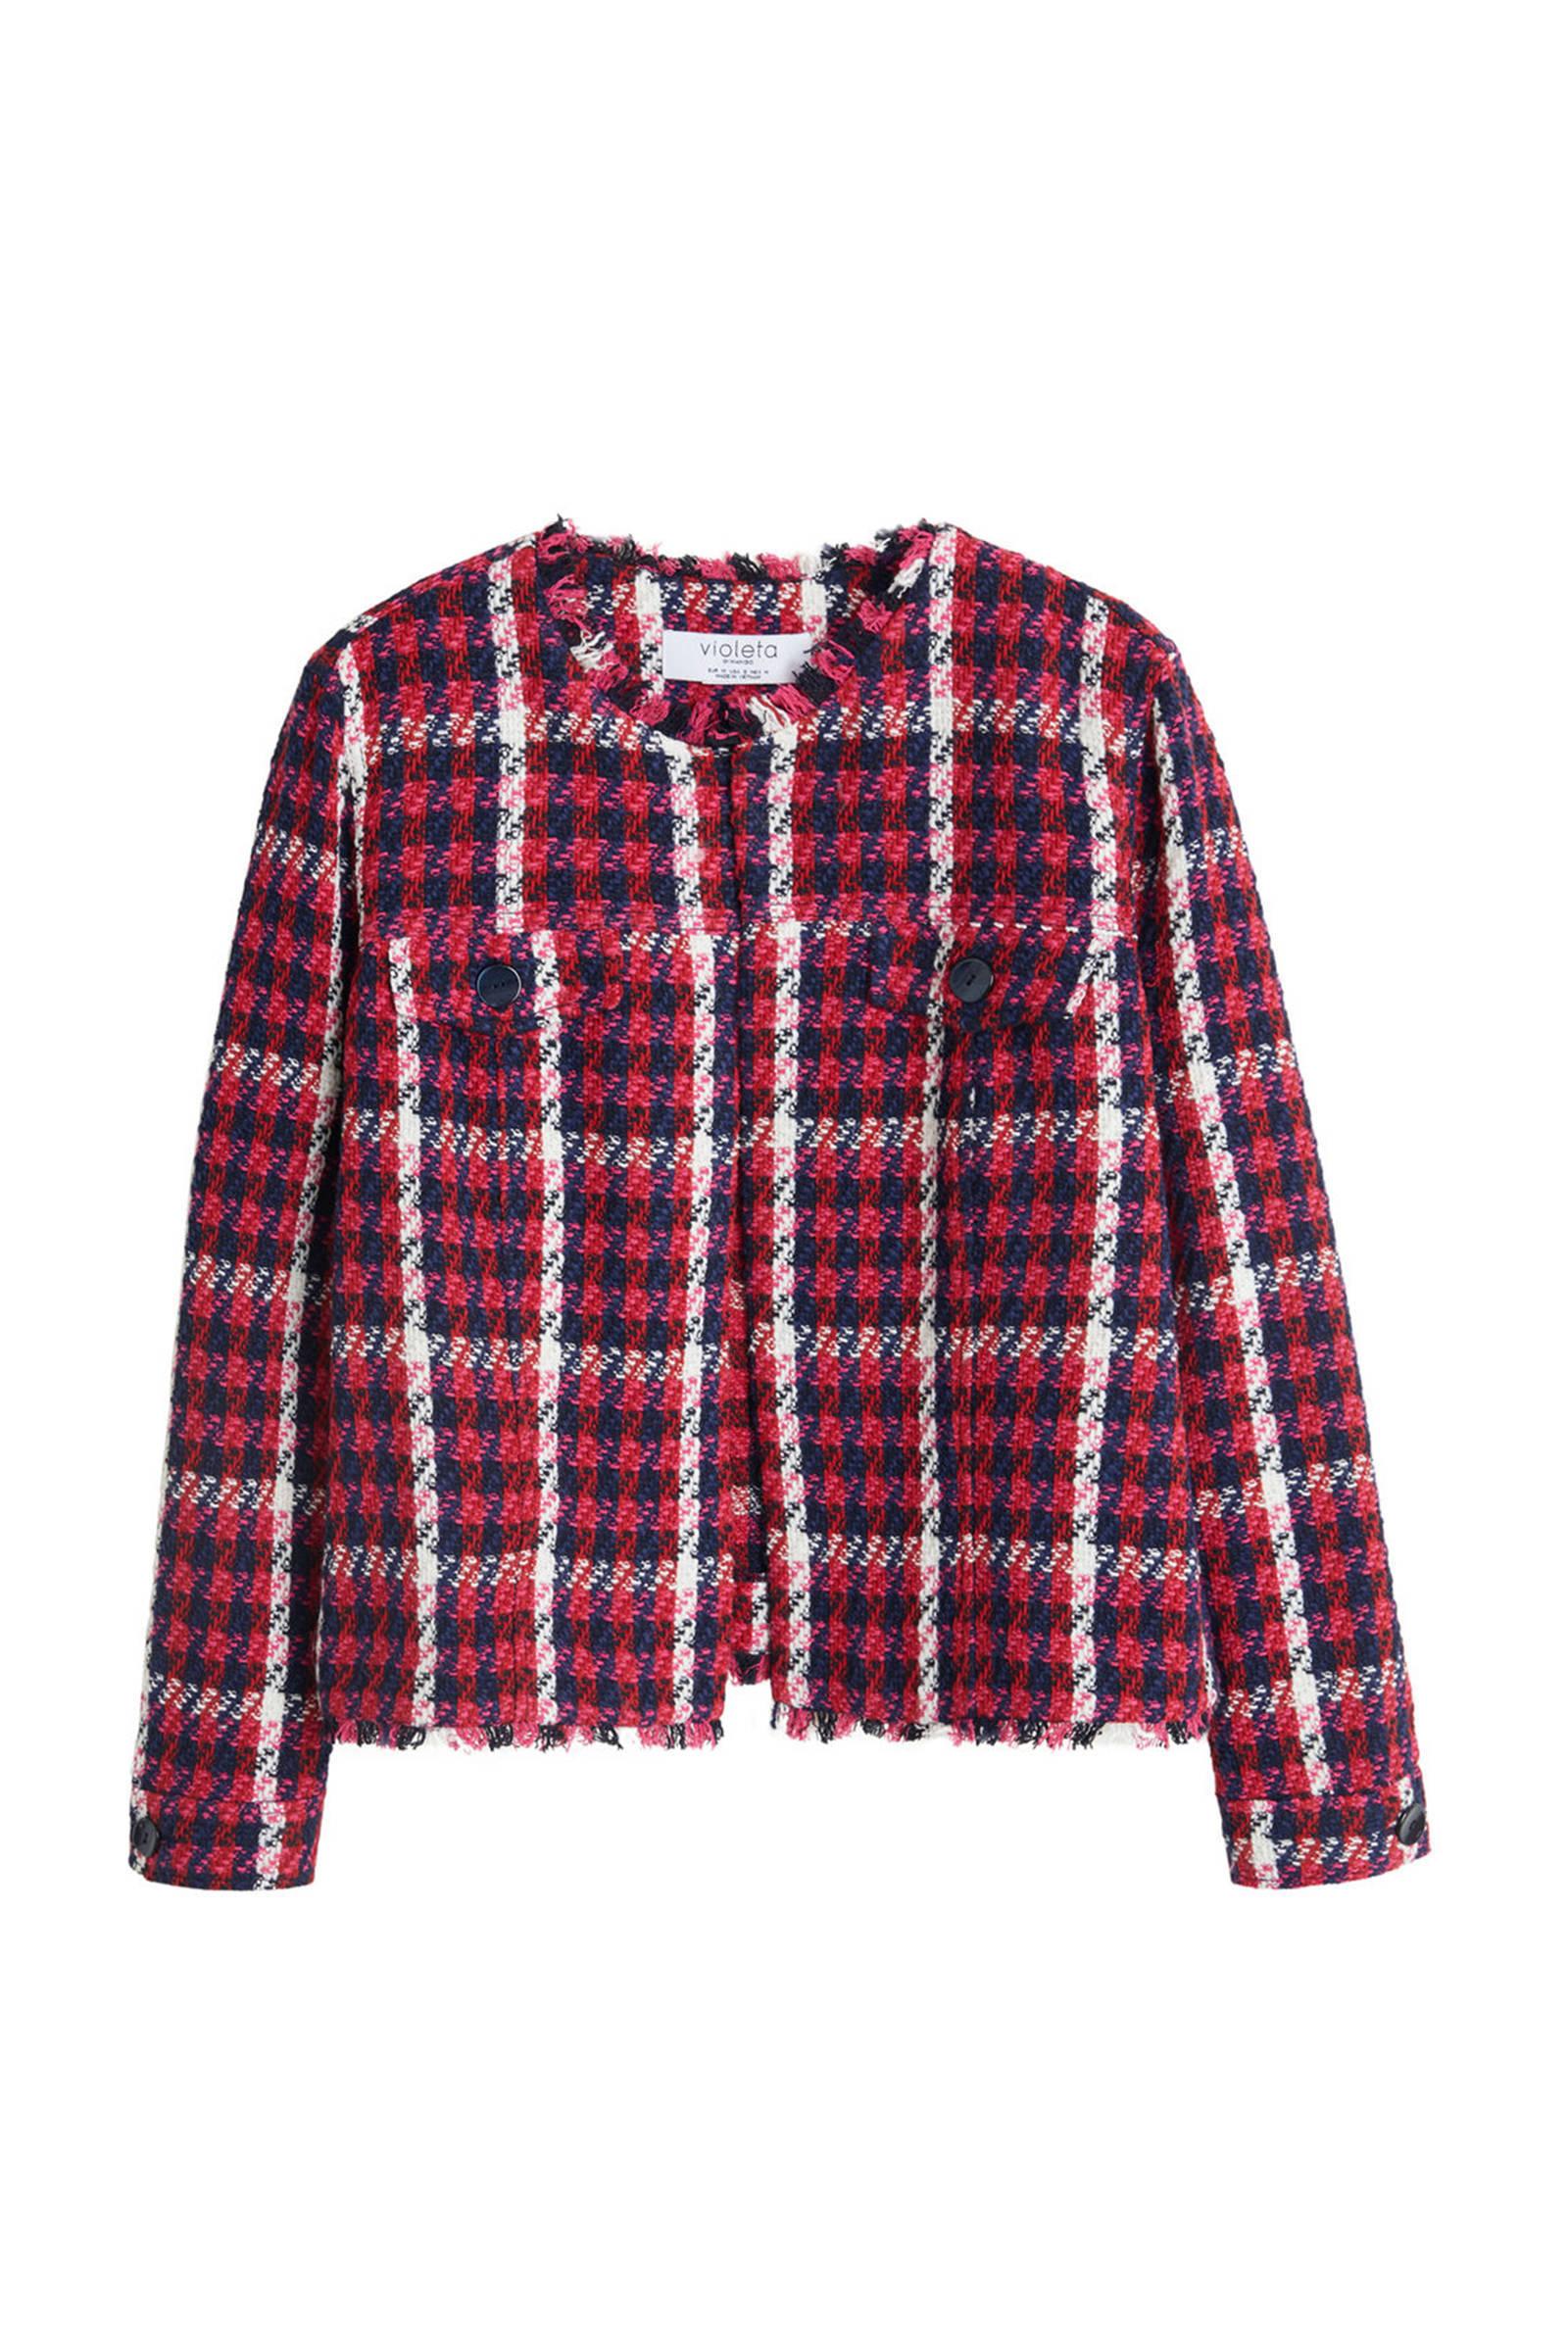 geruit tweed jasje roodblauw